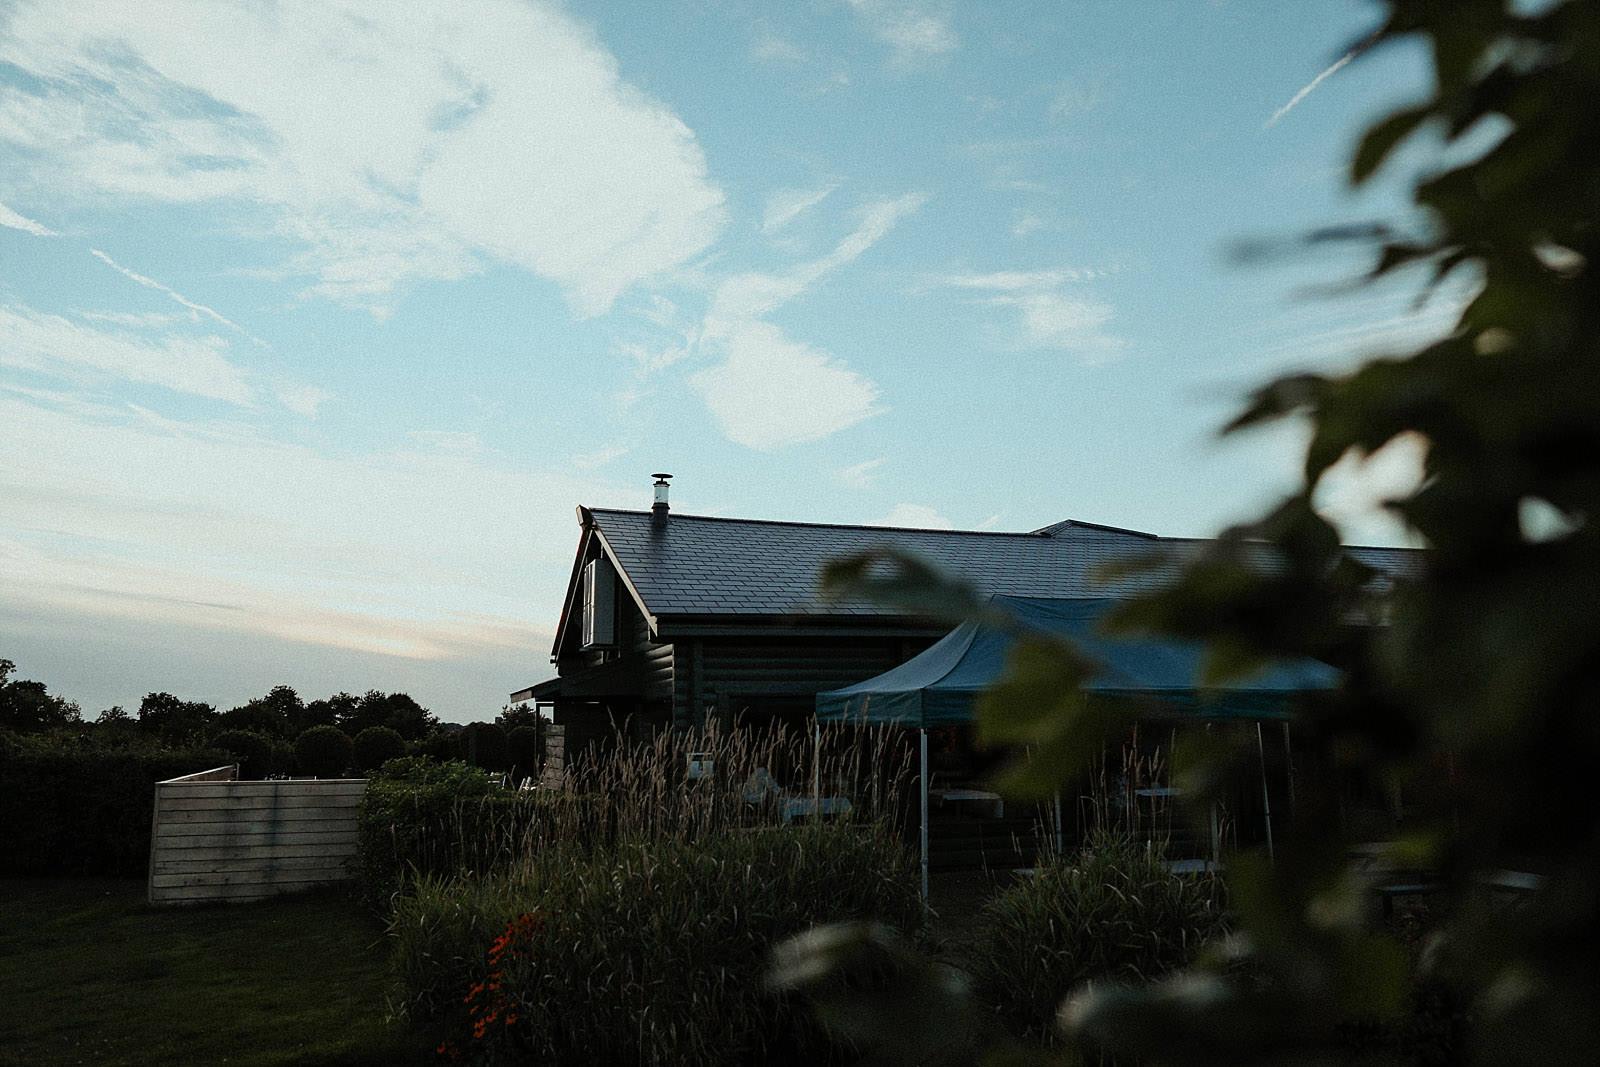 pryors hayes barn style rustic wedding venue